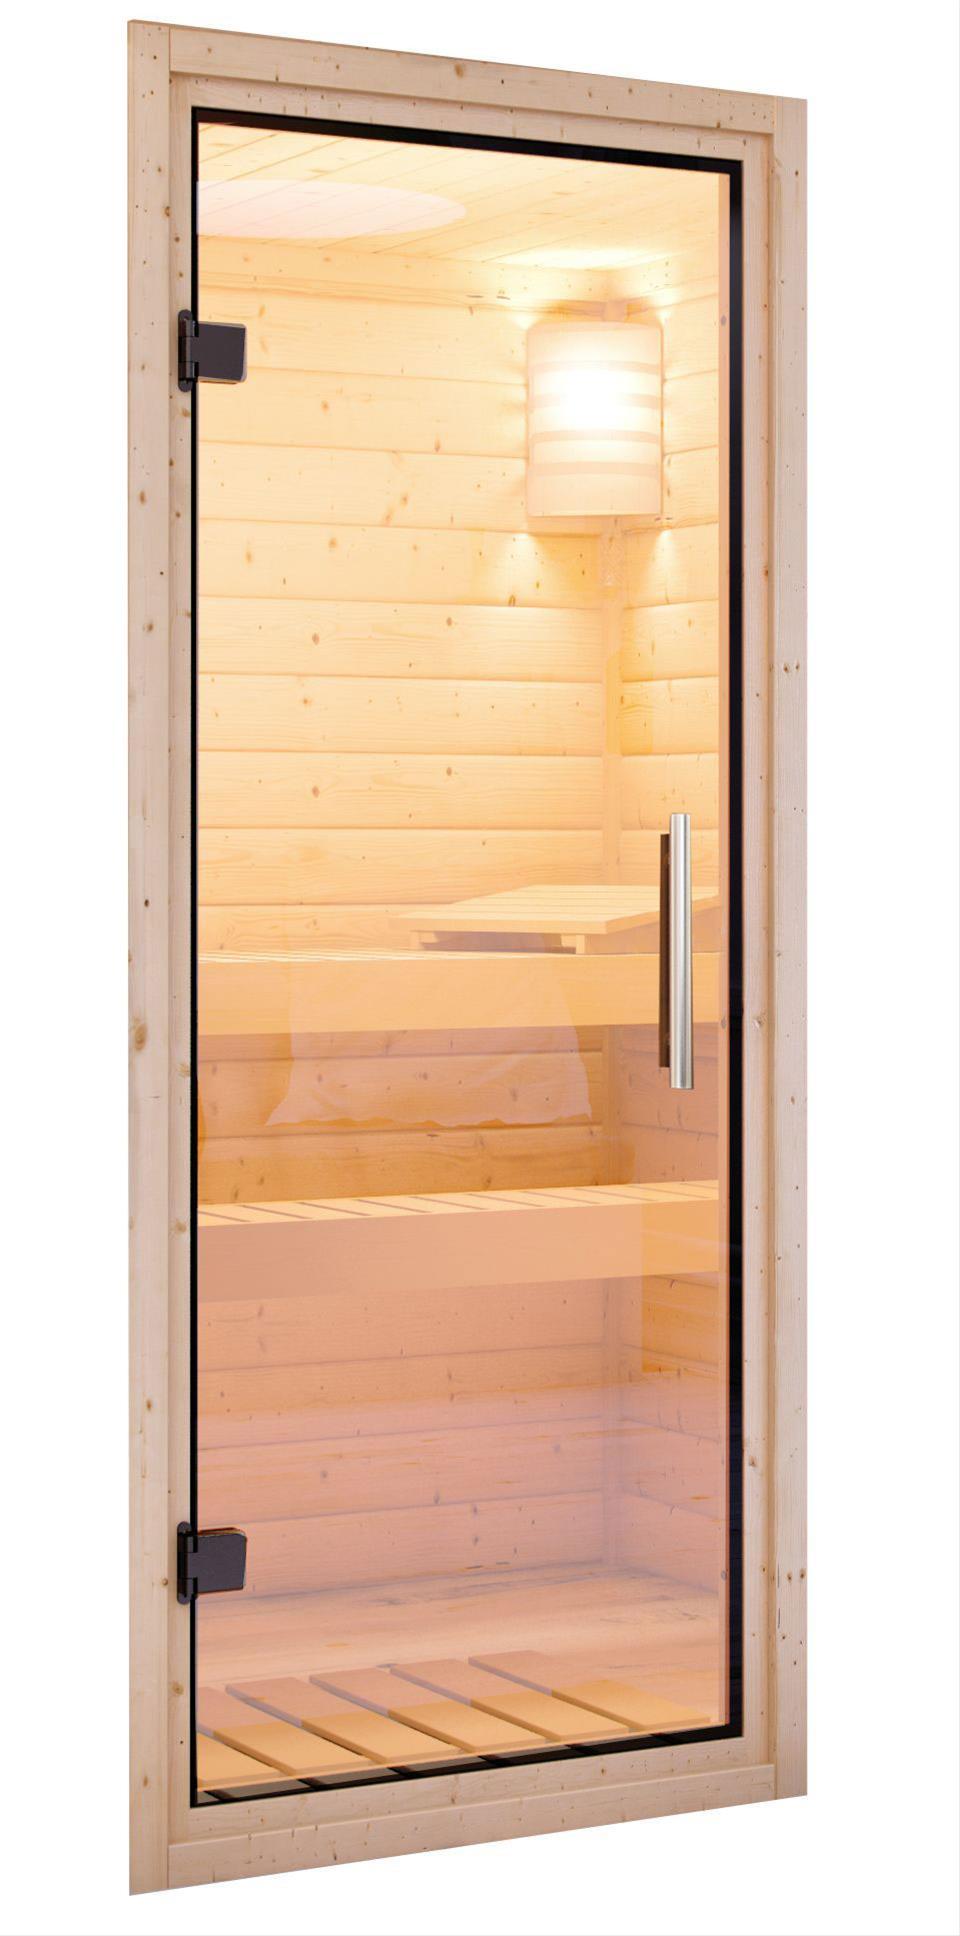 Woodfeeling Sauna Leona 38mm Kranz Ofen 9kW intern Tür Klarglas Bild 6